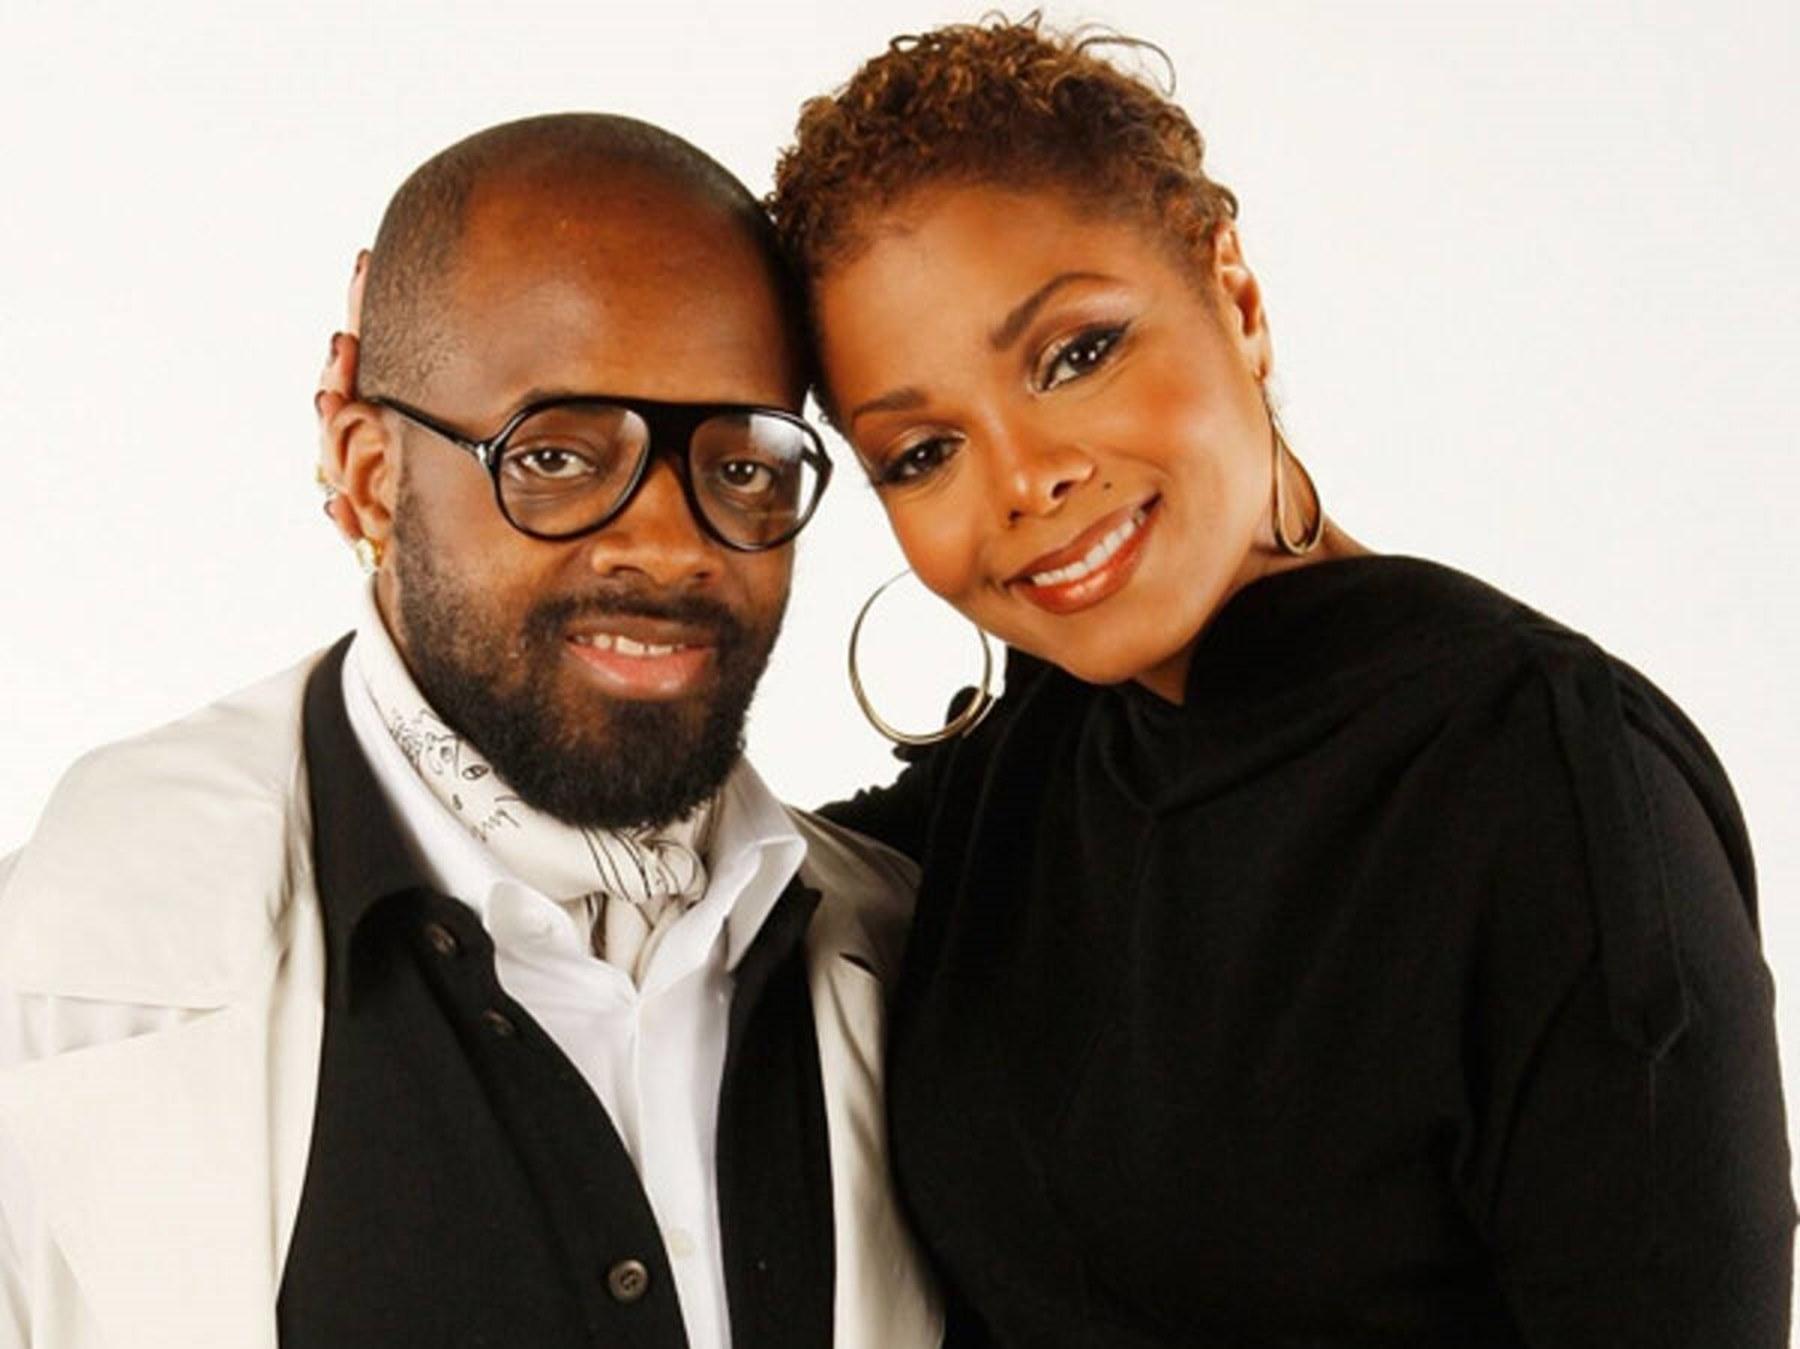 Jermaine Dupri Janet Jackson Reasons For Breakup